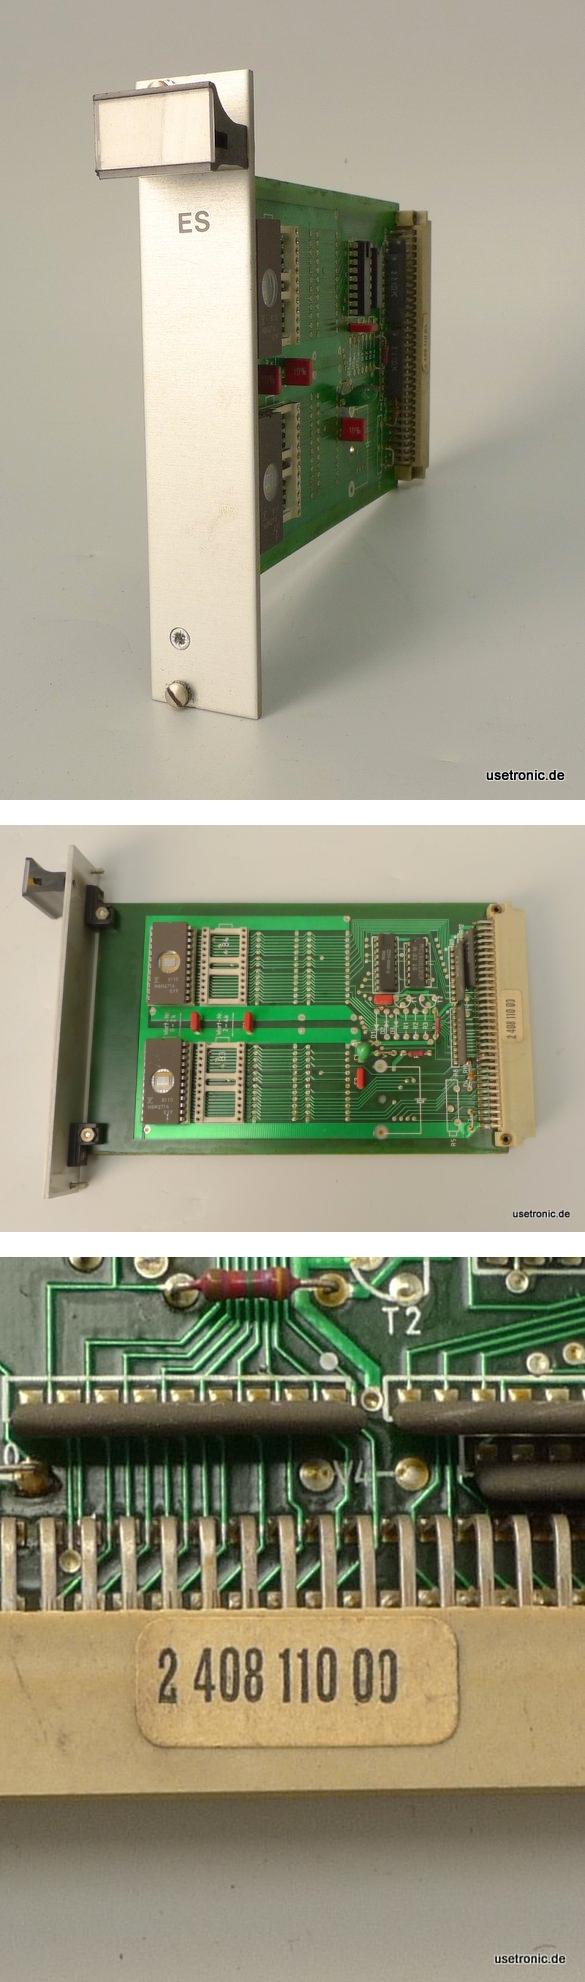 Schiele SPS 600 ES 2.408.110.00 240811000